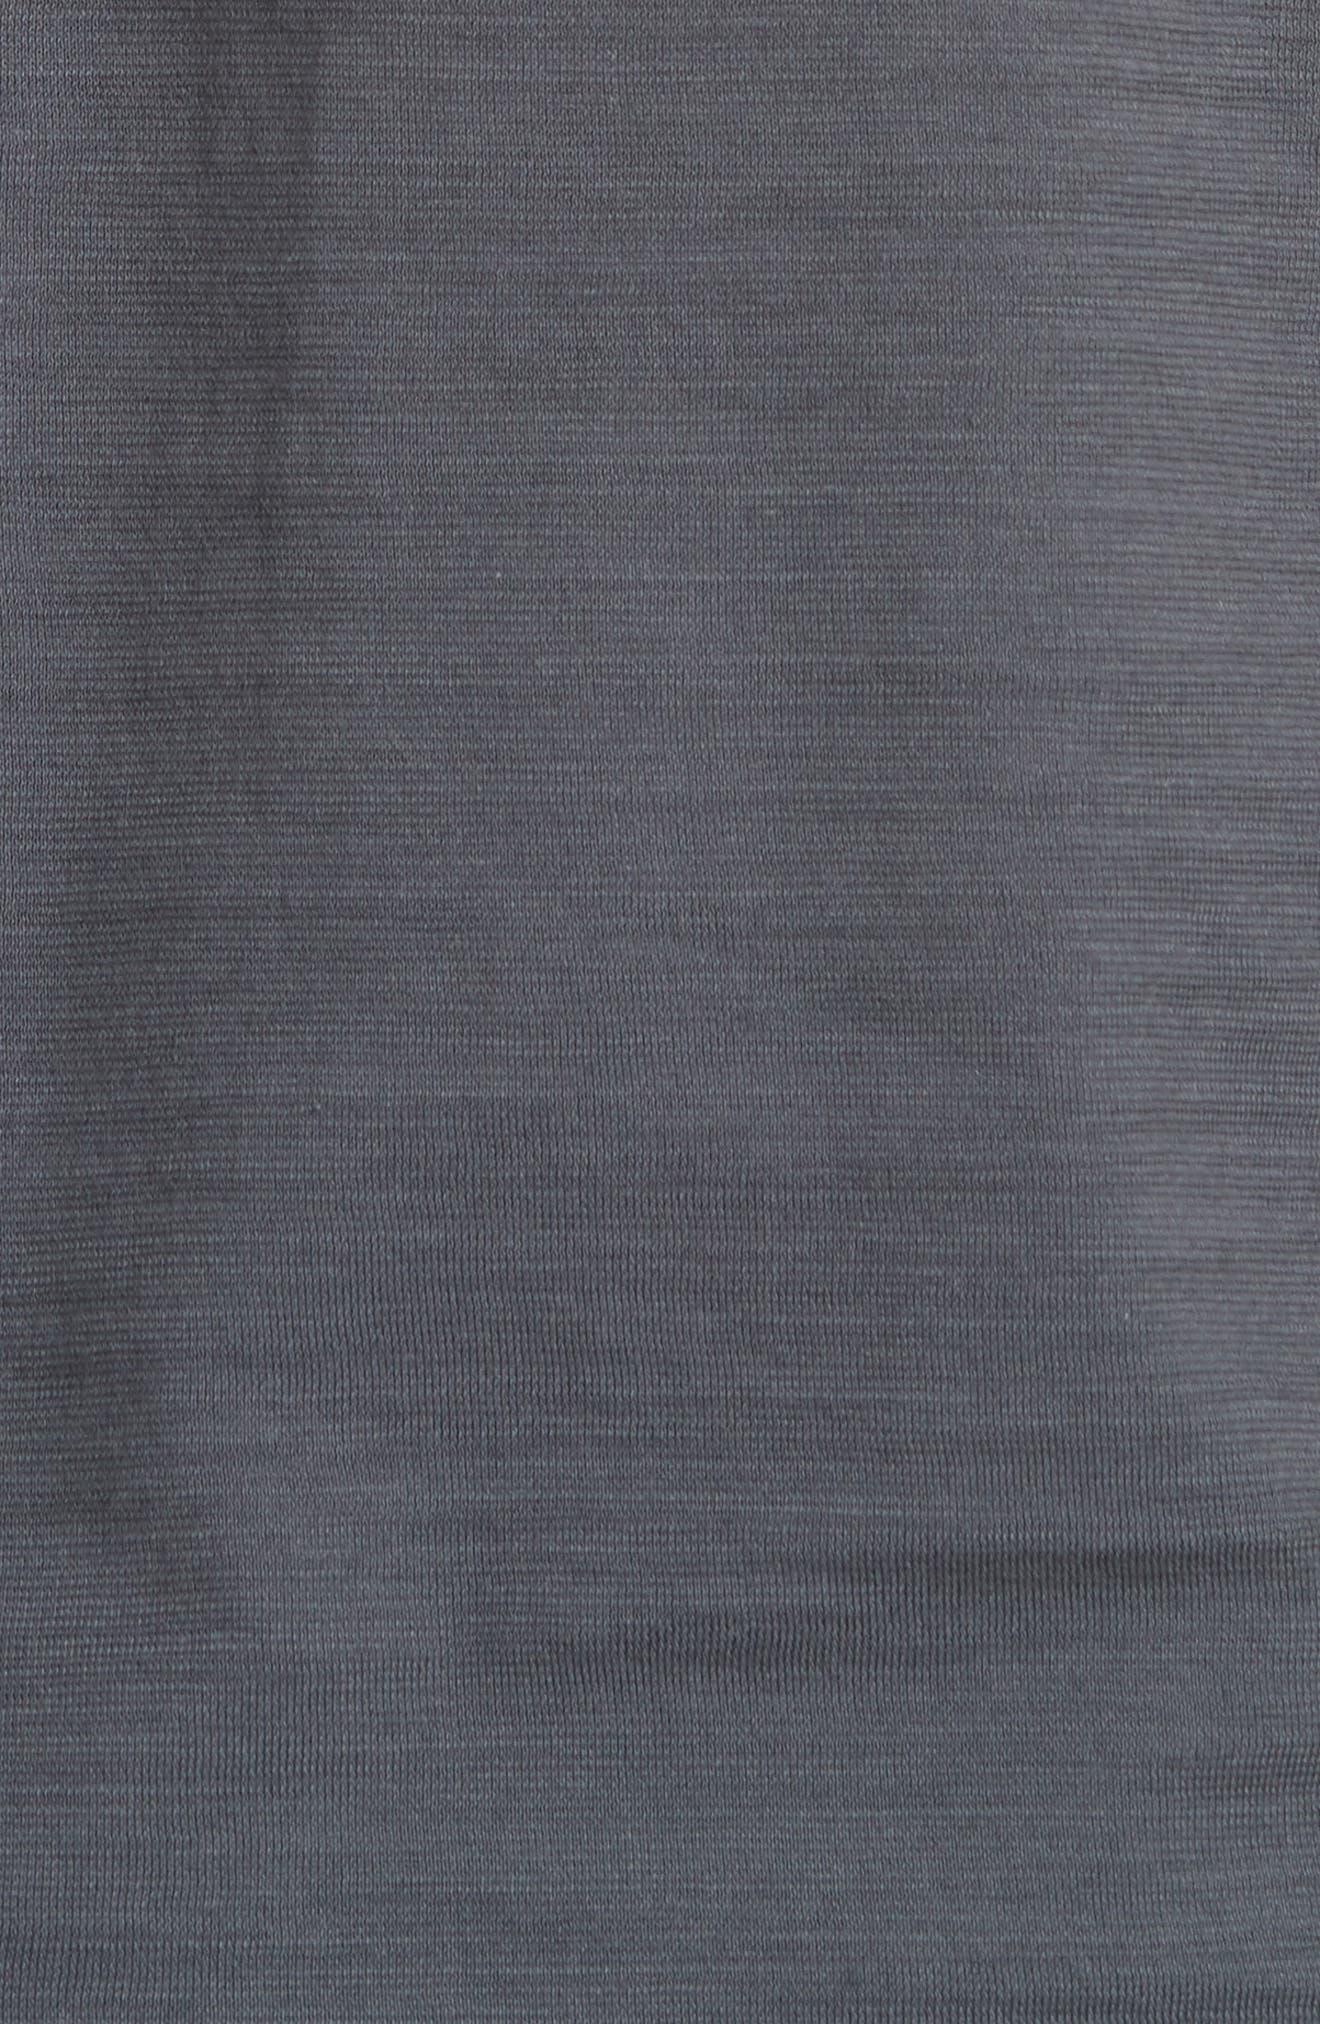 Slub Crewneck T-Shirt,                             Alternate thumbnail 5, color,                             AUBERGINE